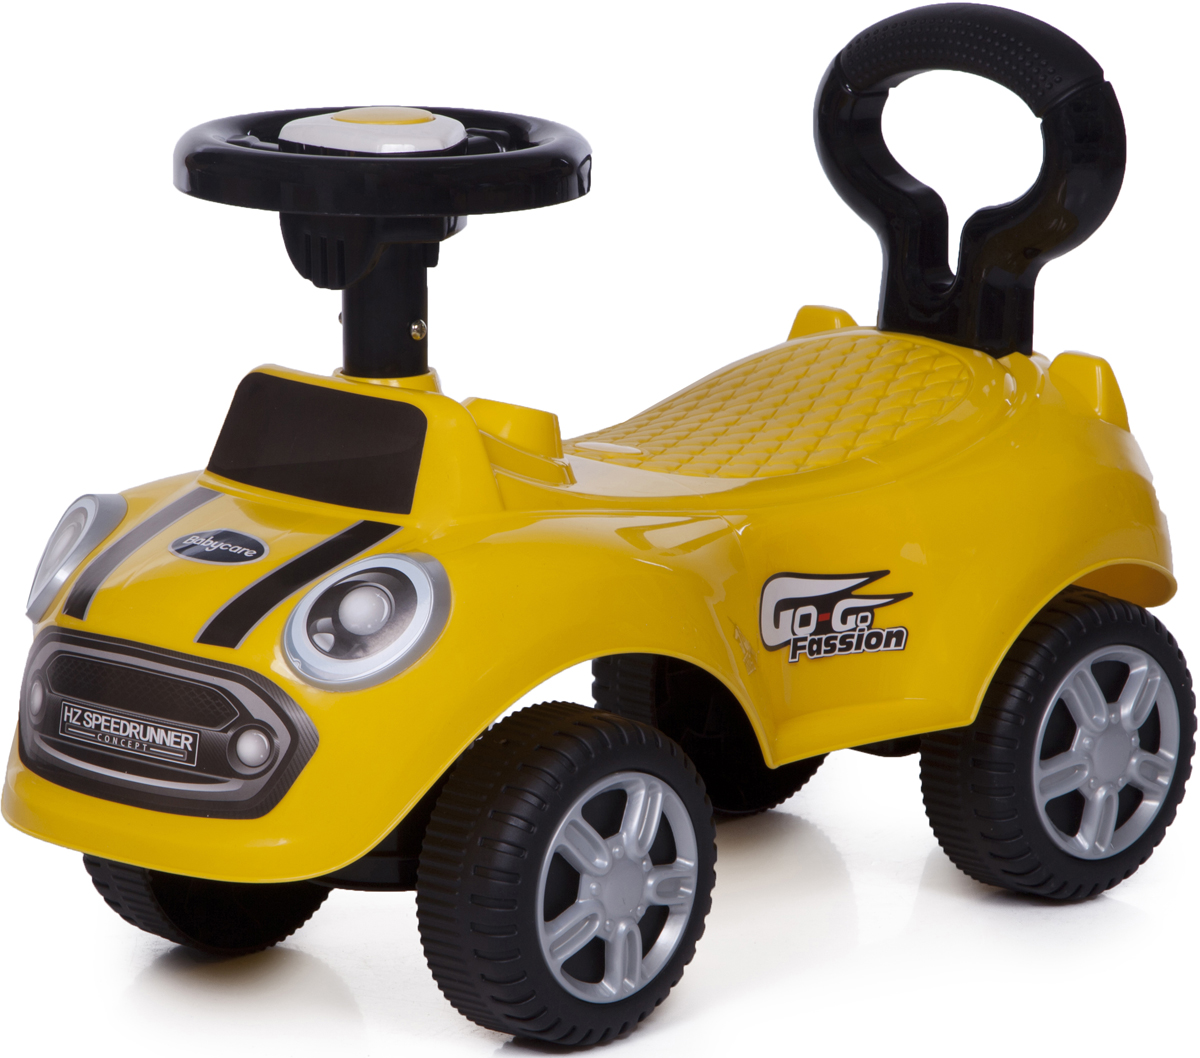 цена Baby Care Каталка детская Speedrunner цвет желтый онлайн в 2017 году